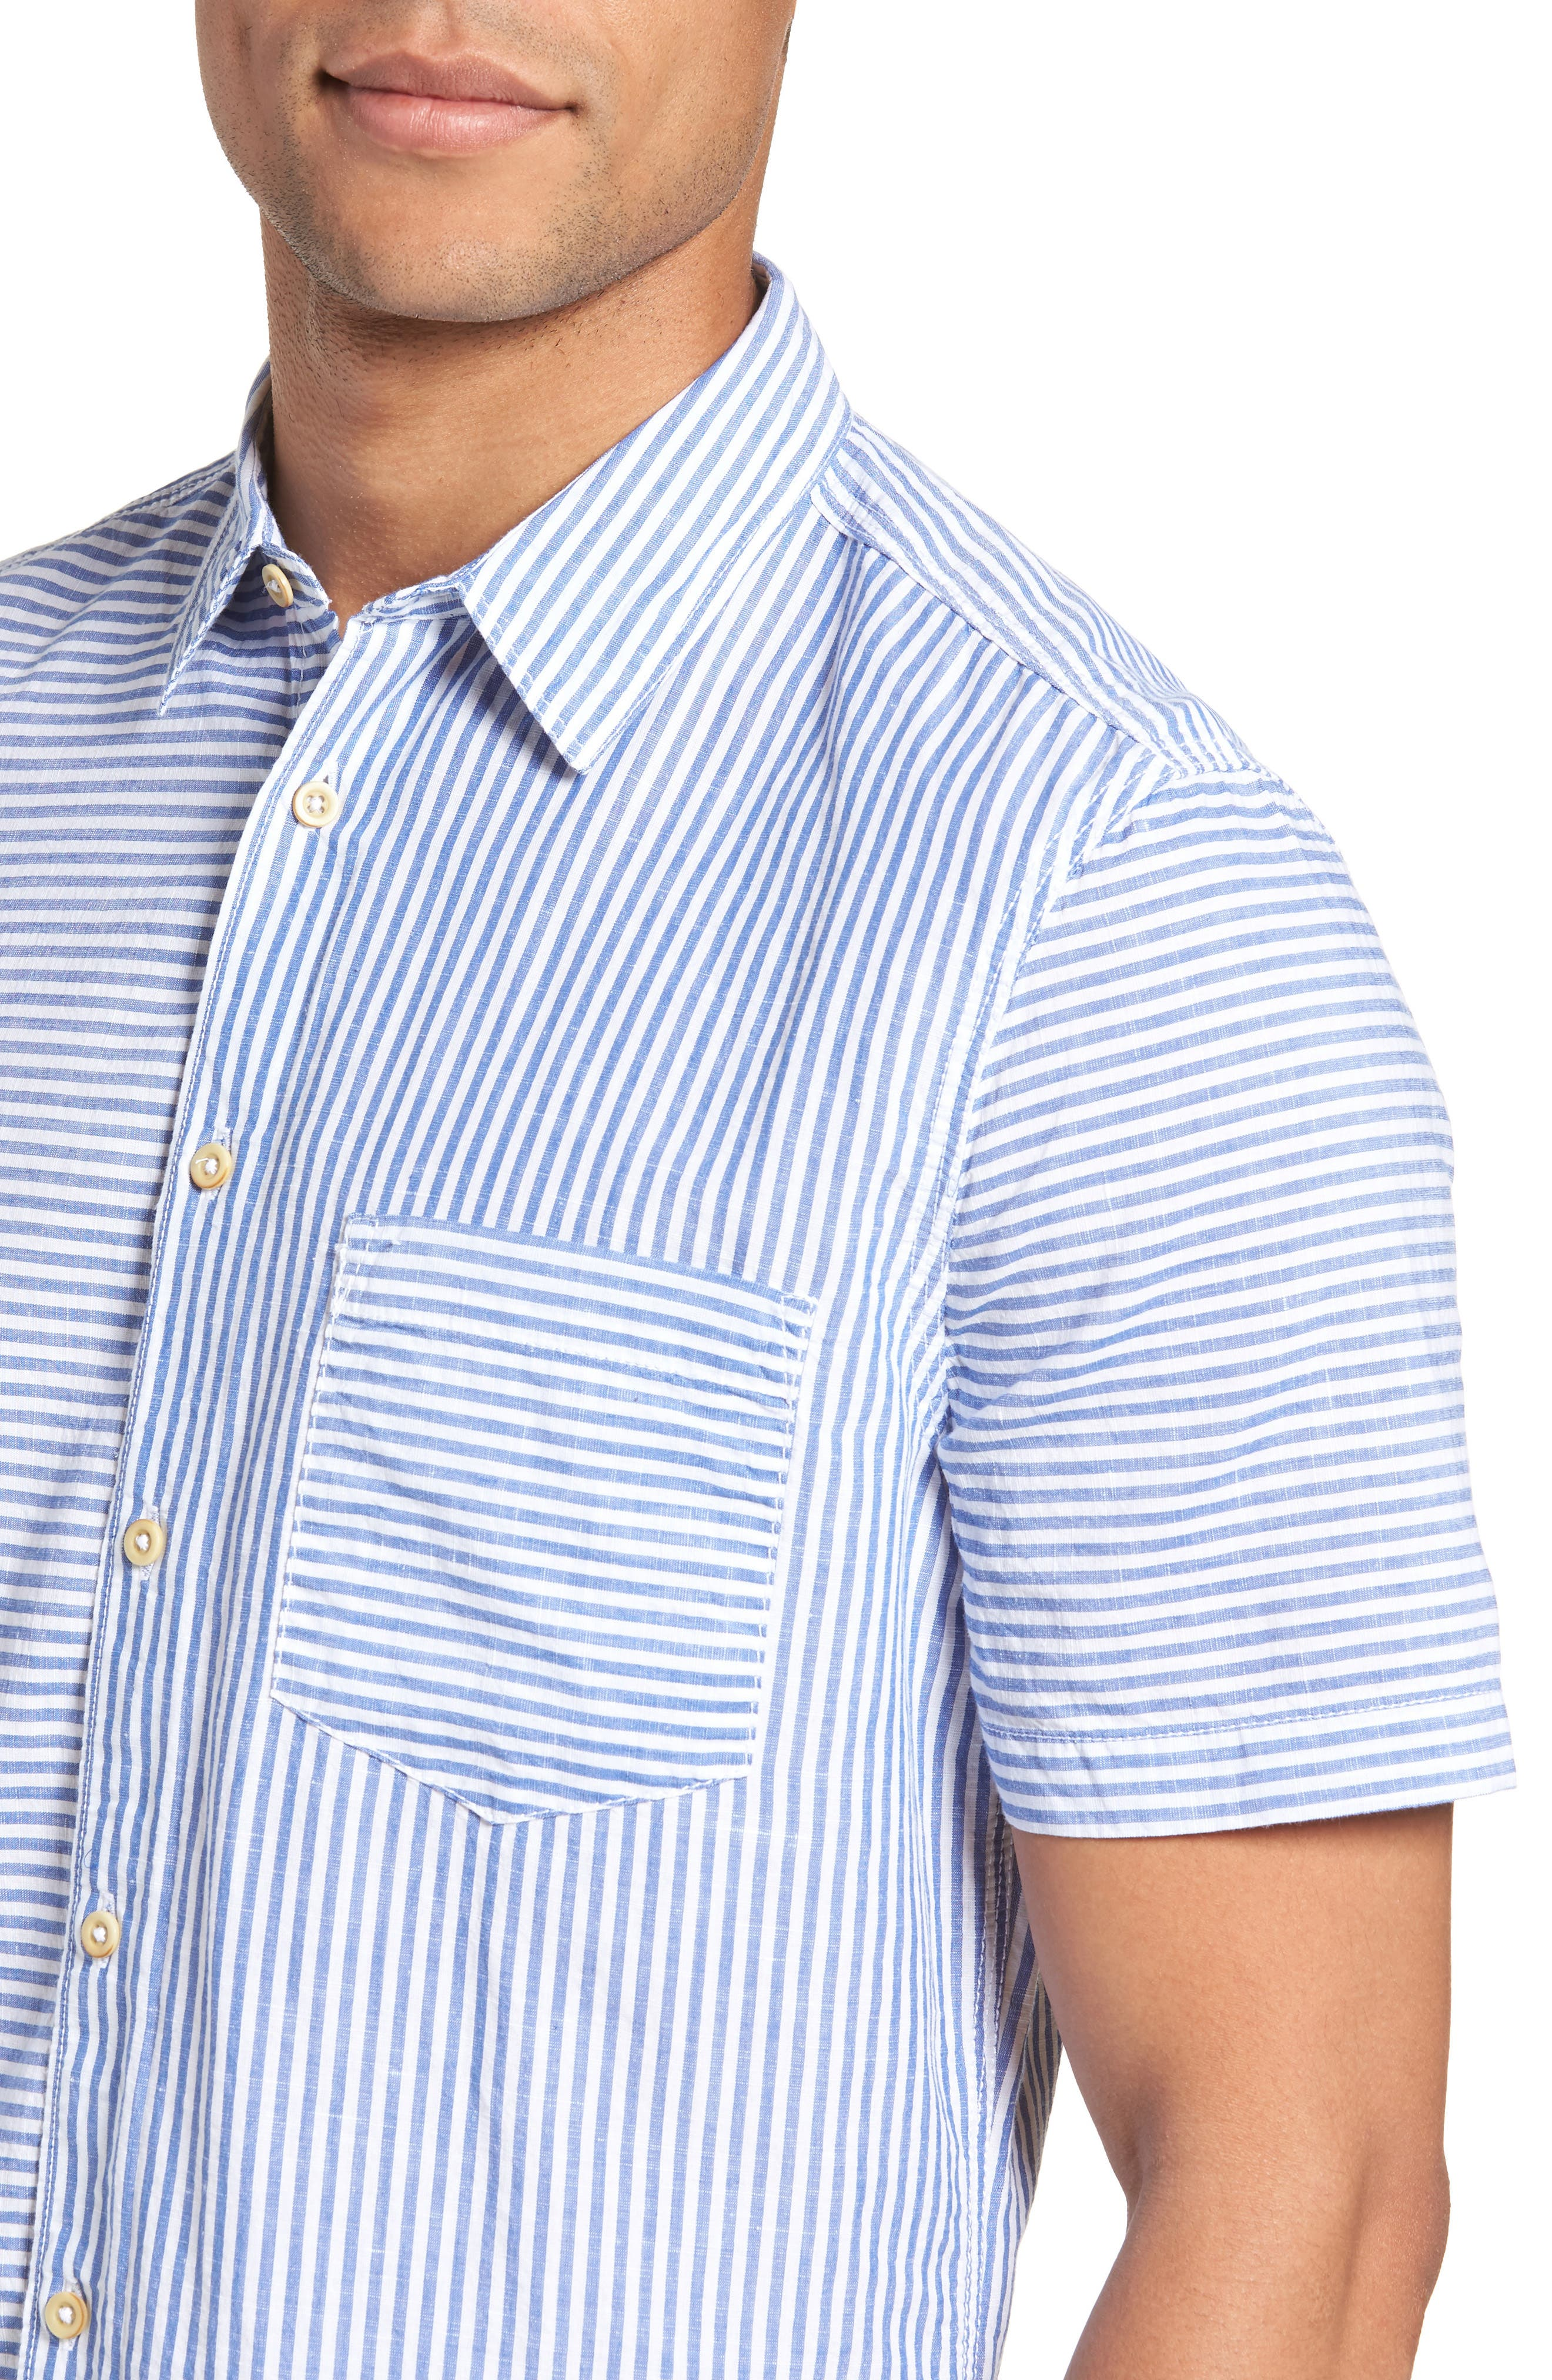 Stripe Chambray Cotton & Linen Sport Shirt,                             Alternate thumbnail 4, color,                             RICH BLUE